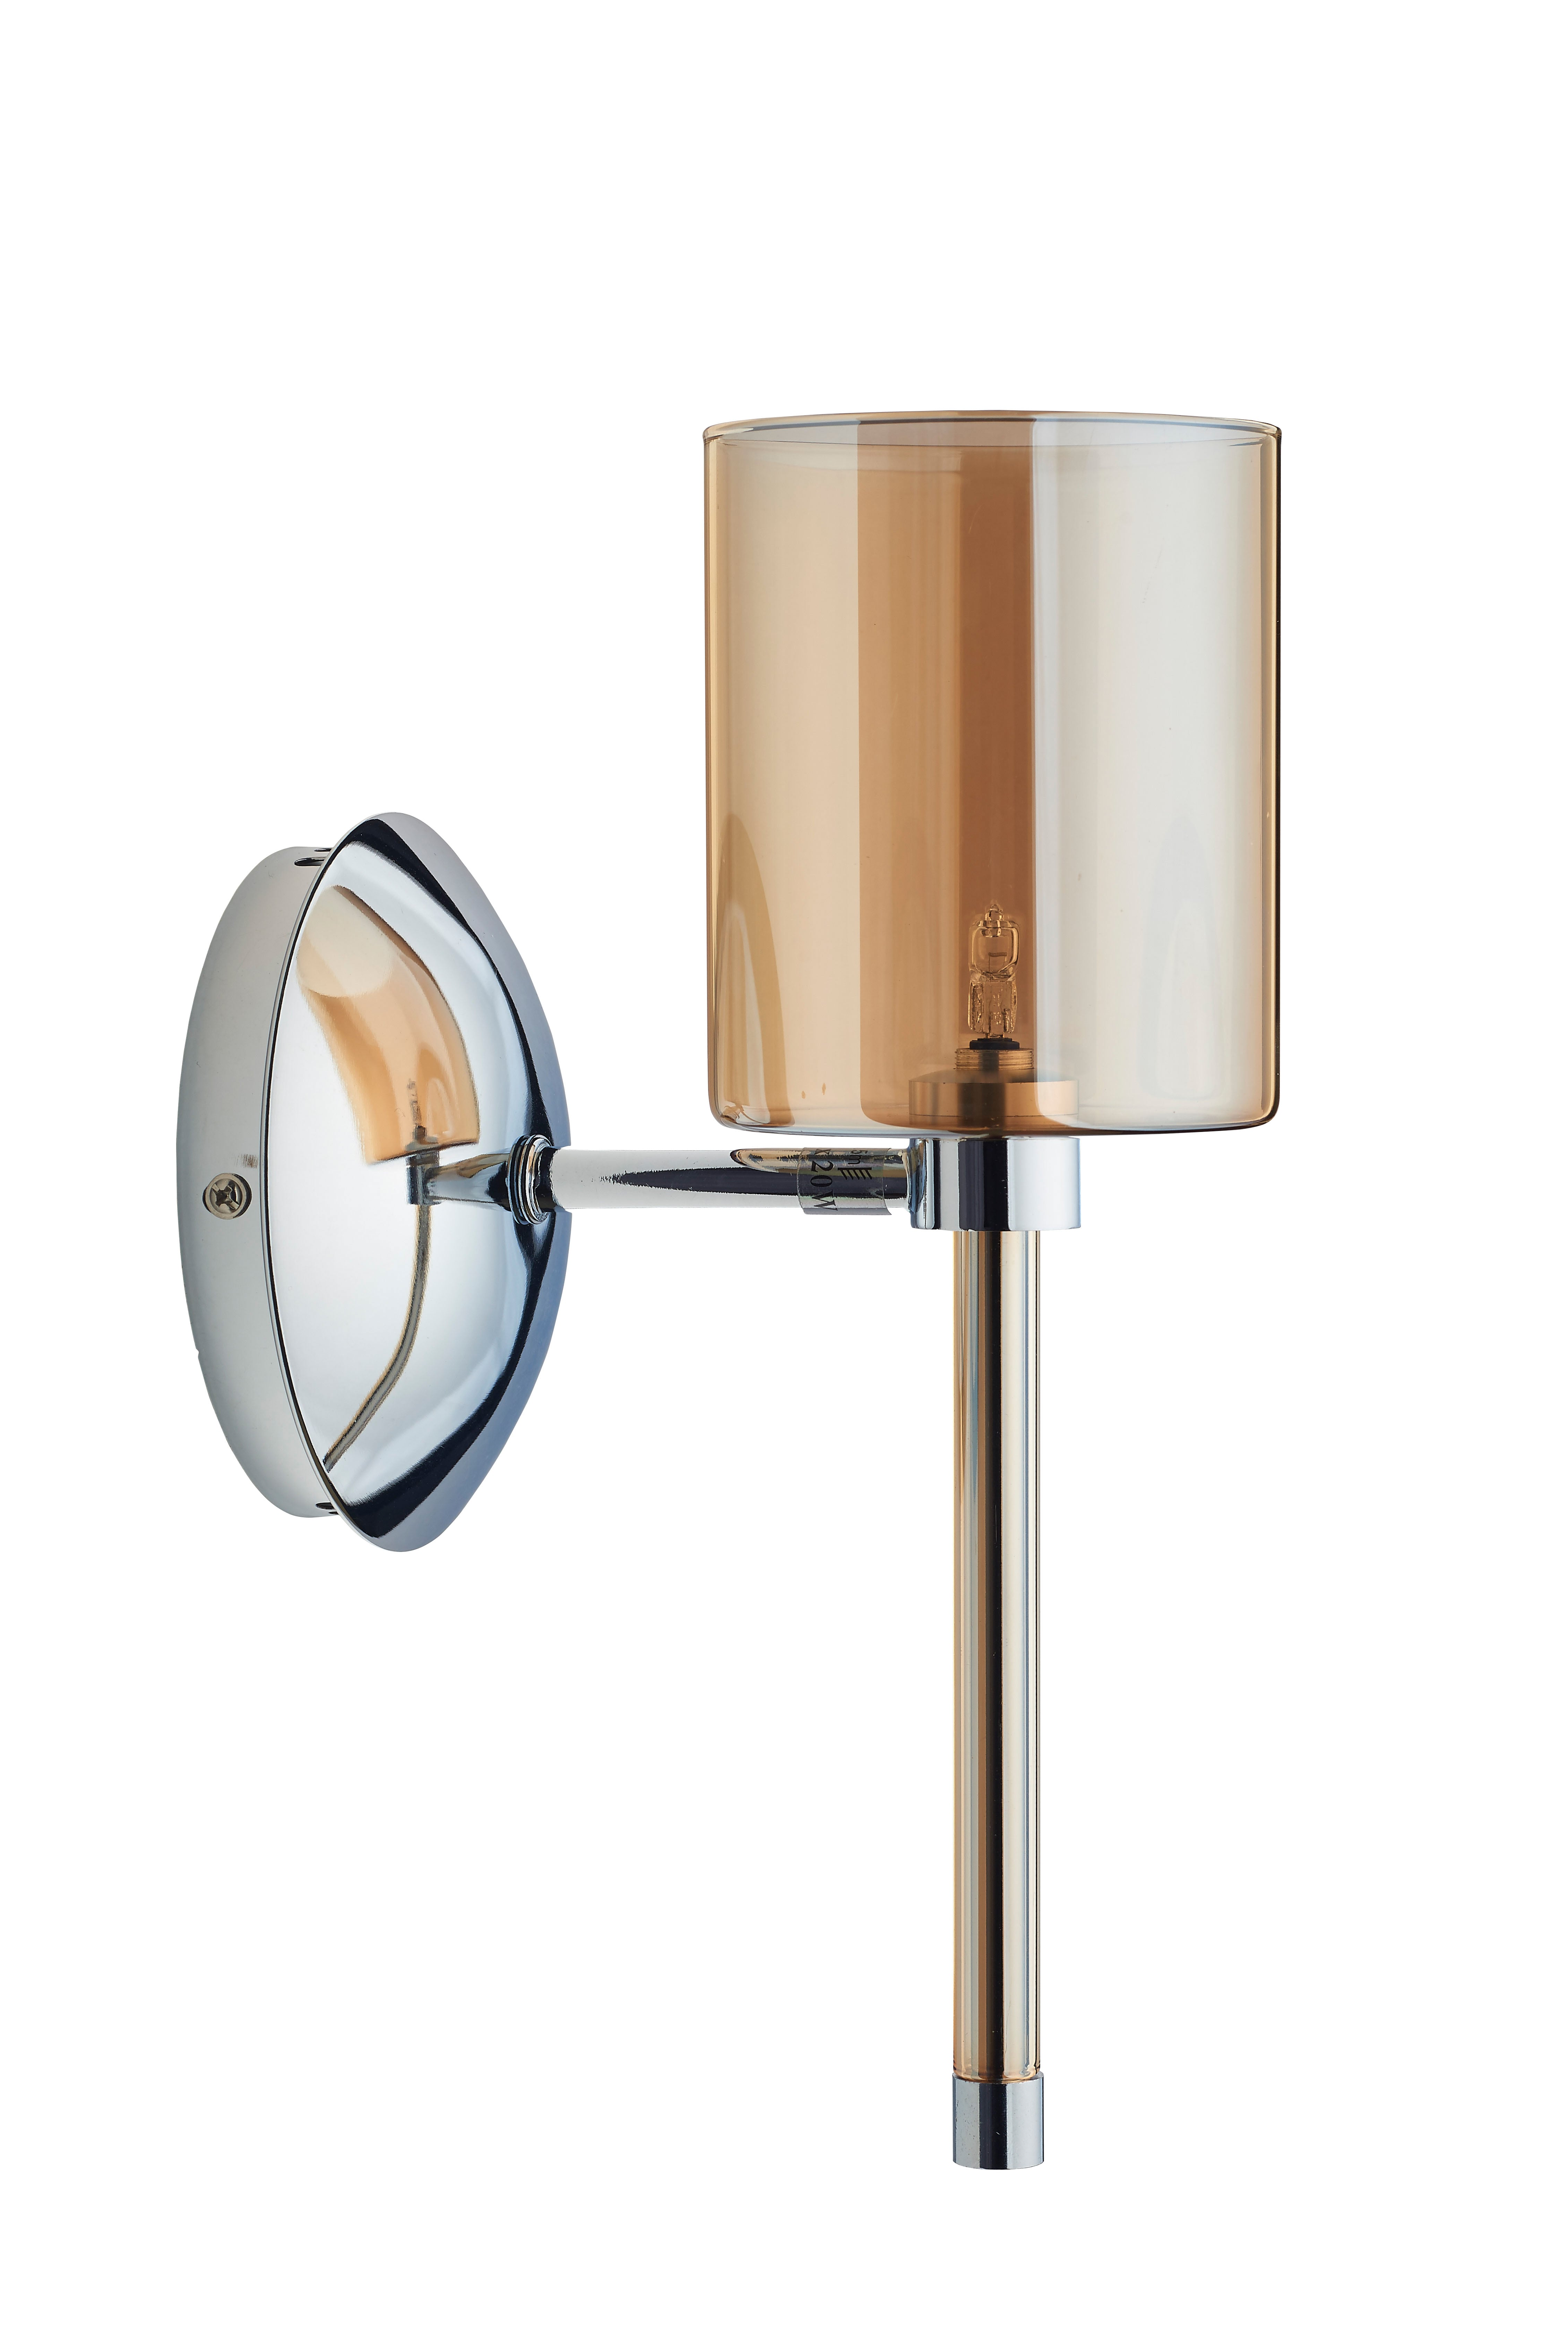 Modernist Flaconetta crom / Champagne G4 20W